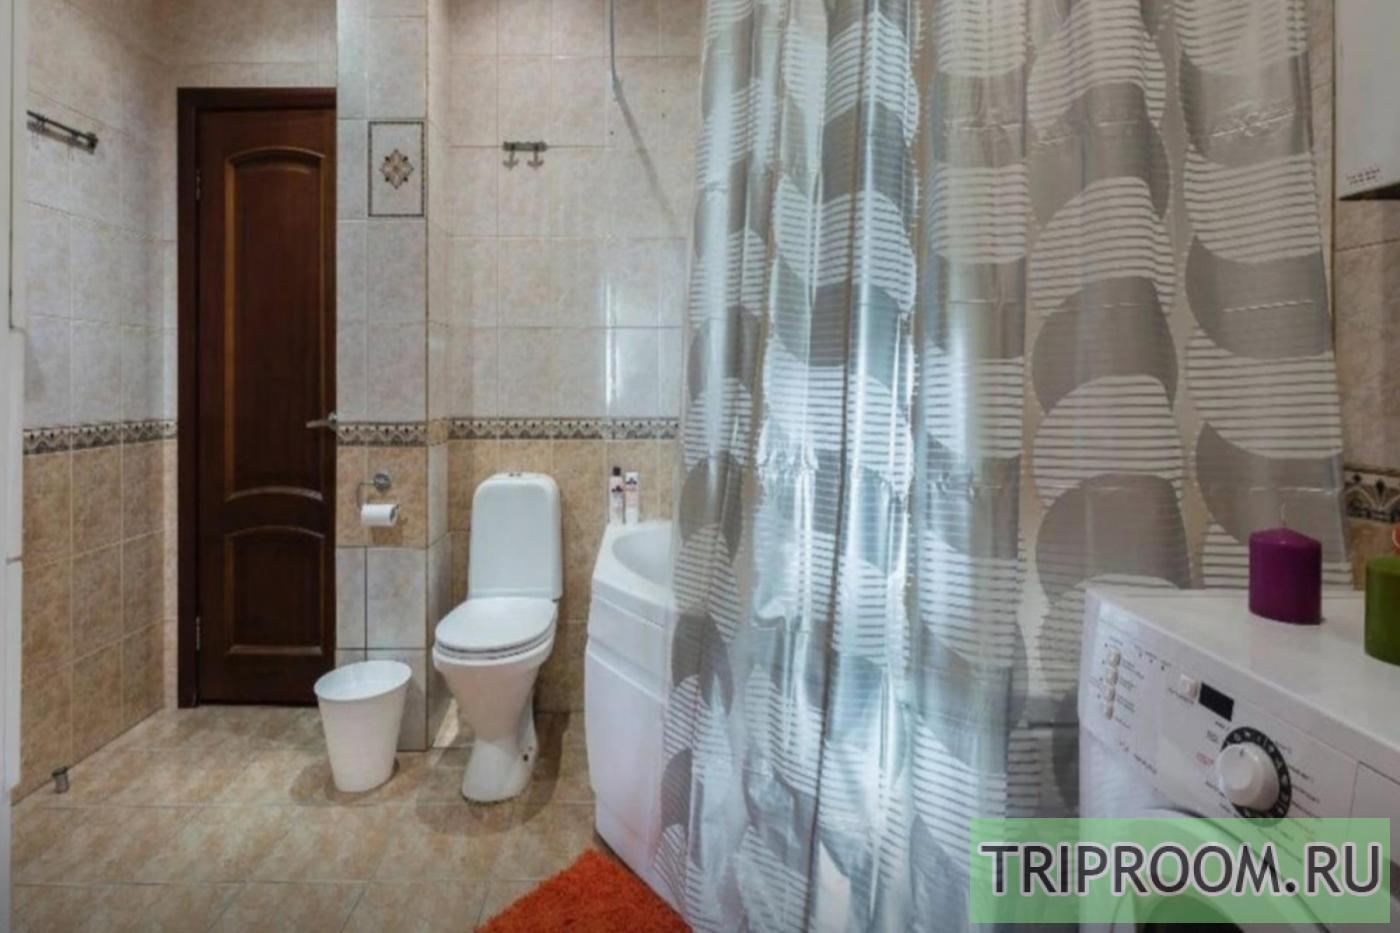 1-комнатная квартира посуточно (вариант № 33441), ул. проспект Соколова, фото № 6